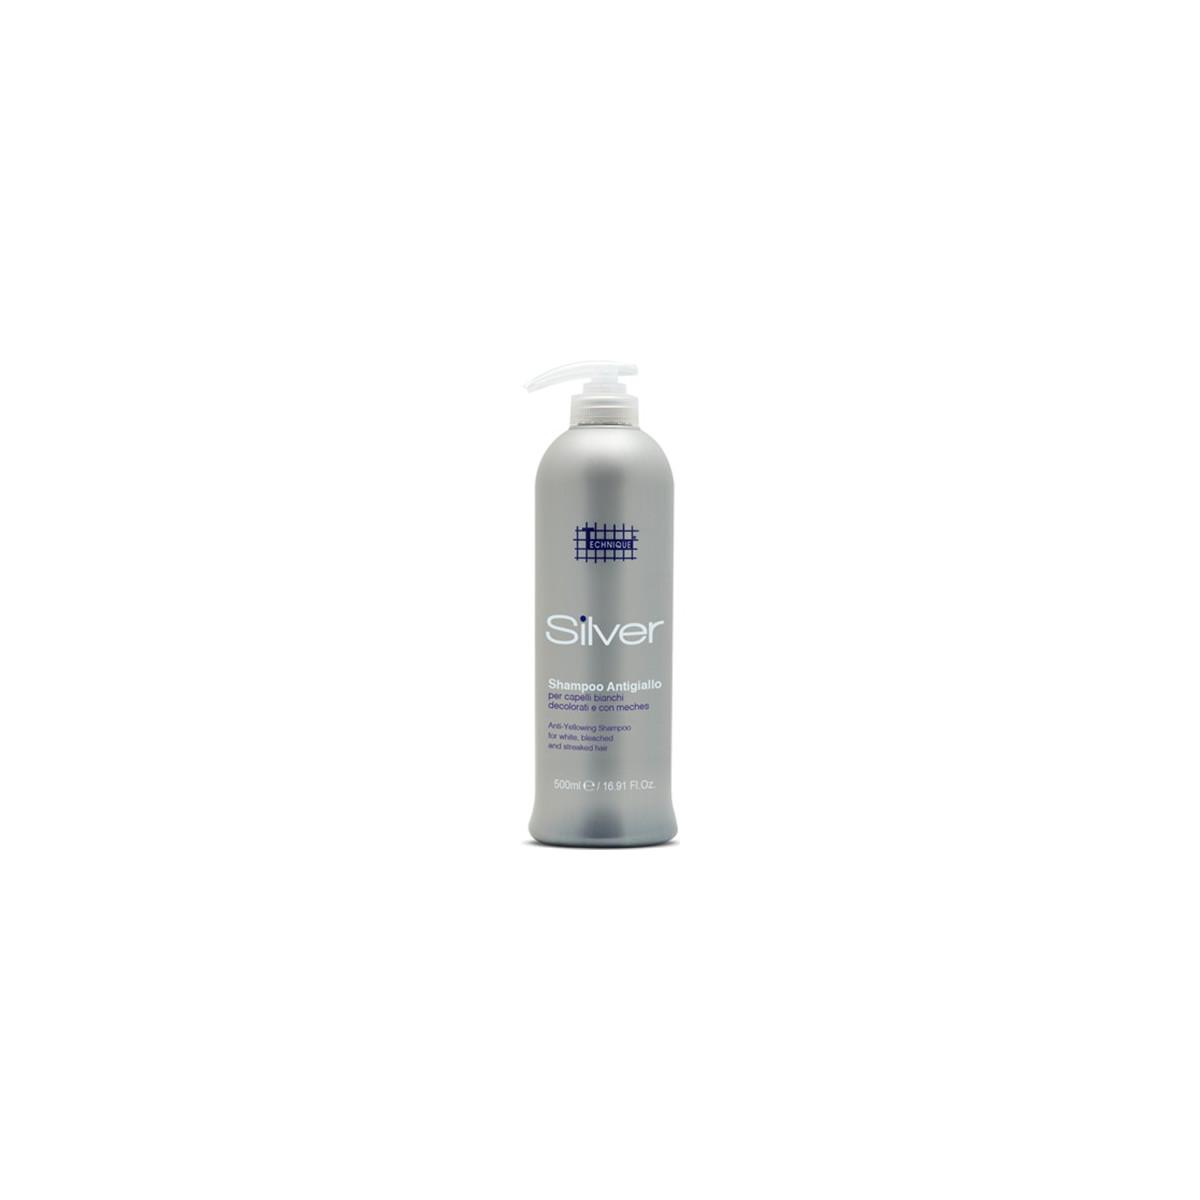 Shampoing anti-jaune Silver Pro - ComProf 500ml